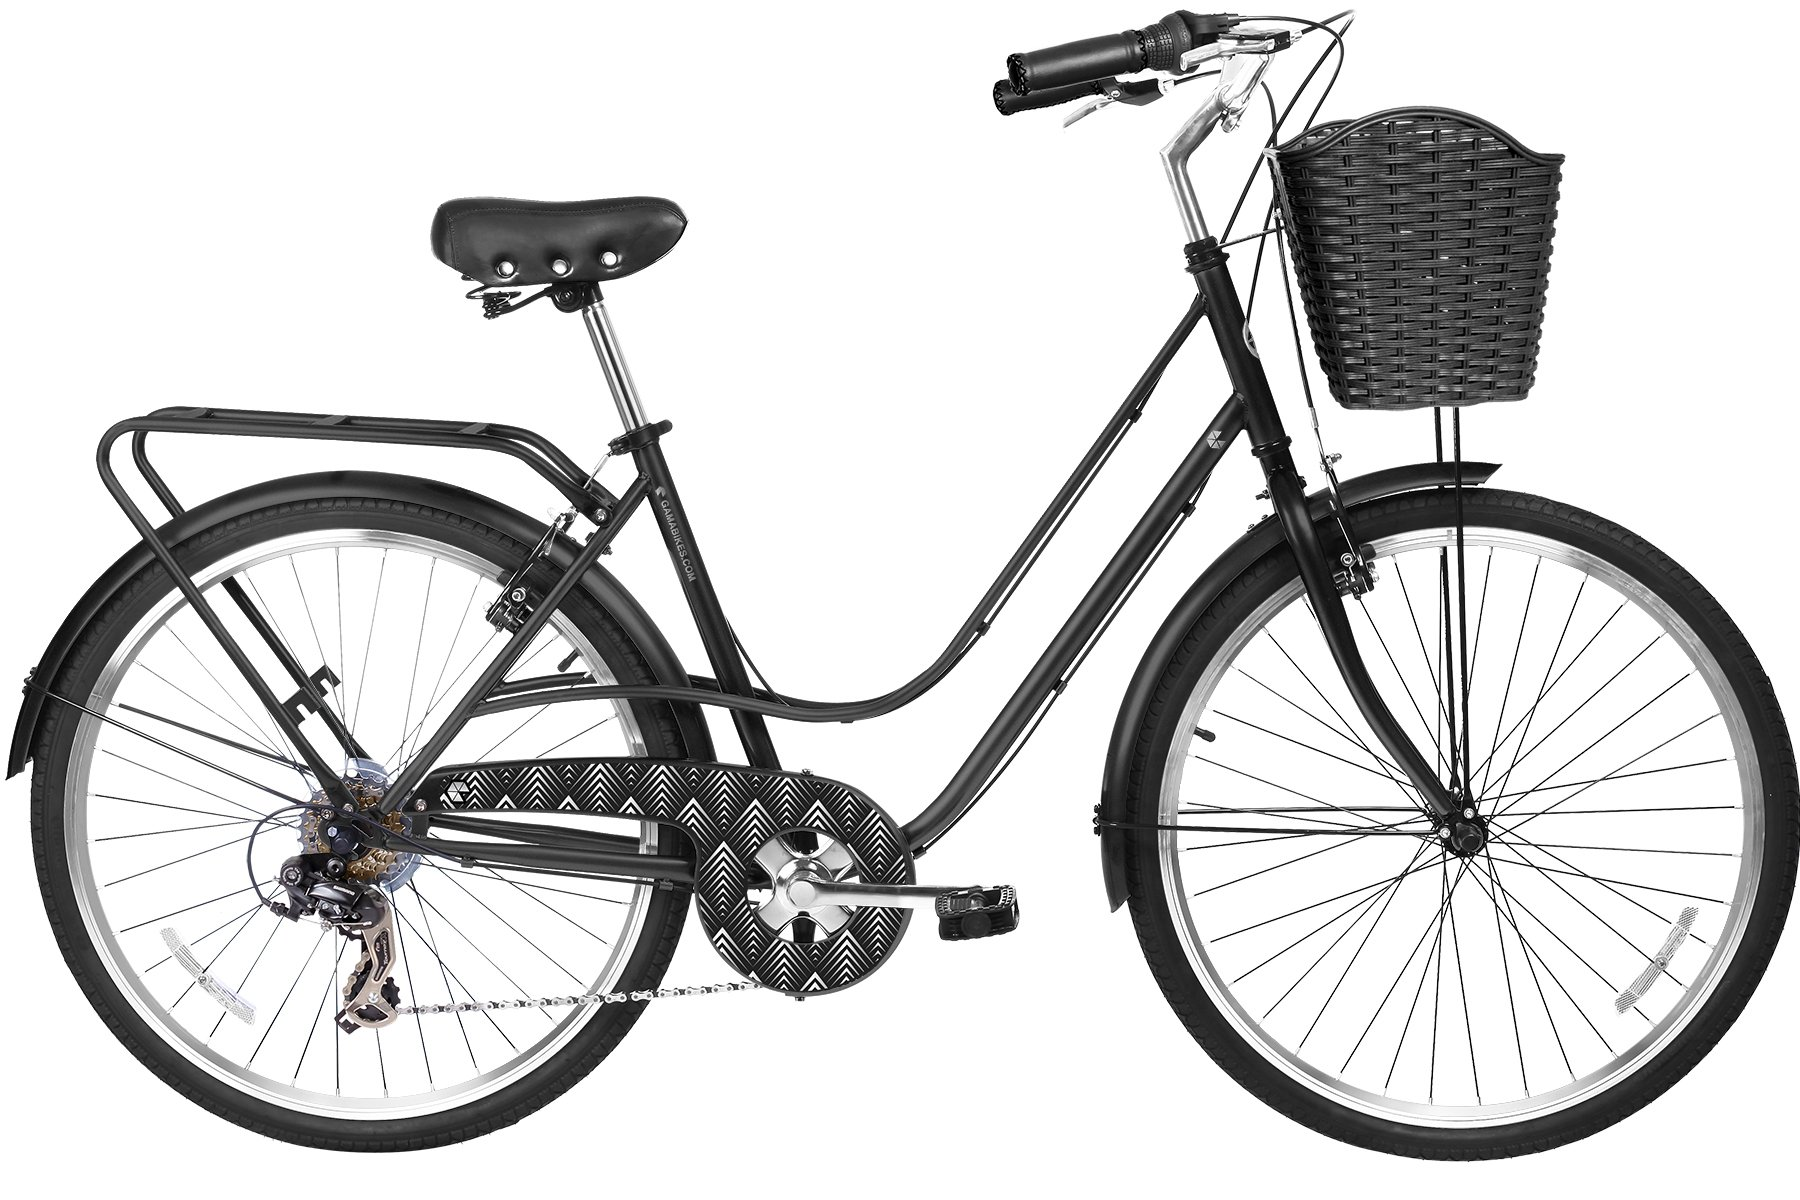 Gama Bikes City Avenue 26 – Women's Cruiser Bike - Step-Through Comfort Frame, 6 Speed Shimano -  Hybrid Urban Commuter Road Bicycle - Great for Beach Cruising, Exercising and All Around Fun – Black